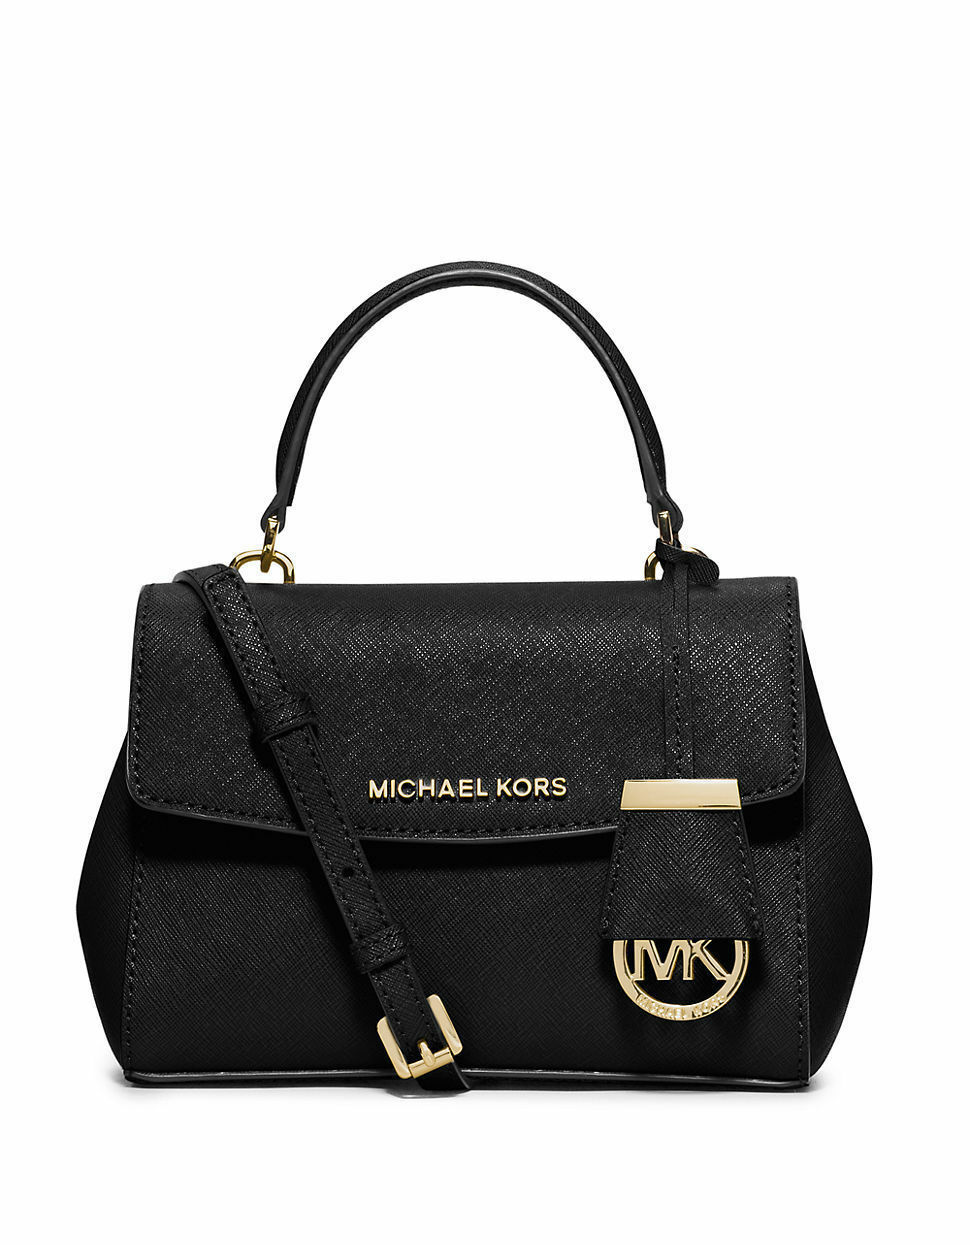 2ec7f377be5 Michael Kors Women's Ava Extra Small Cross Body Leather Handbag - Black